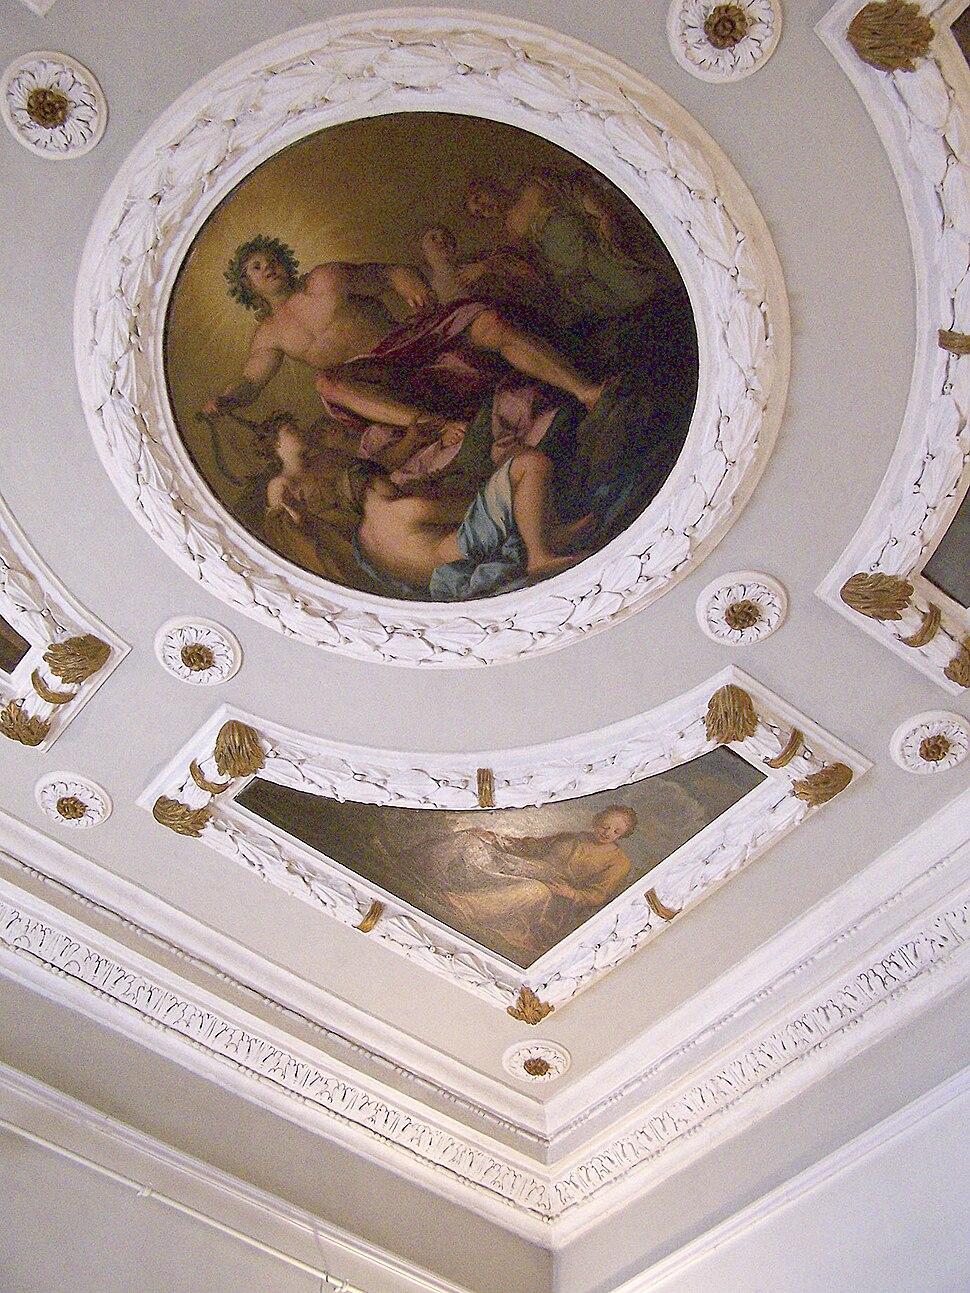 Onamental ceiling Palazzo Chiericati Vicenza